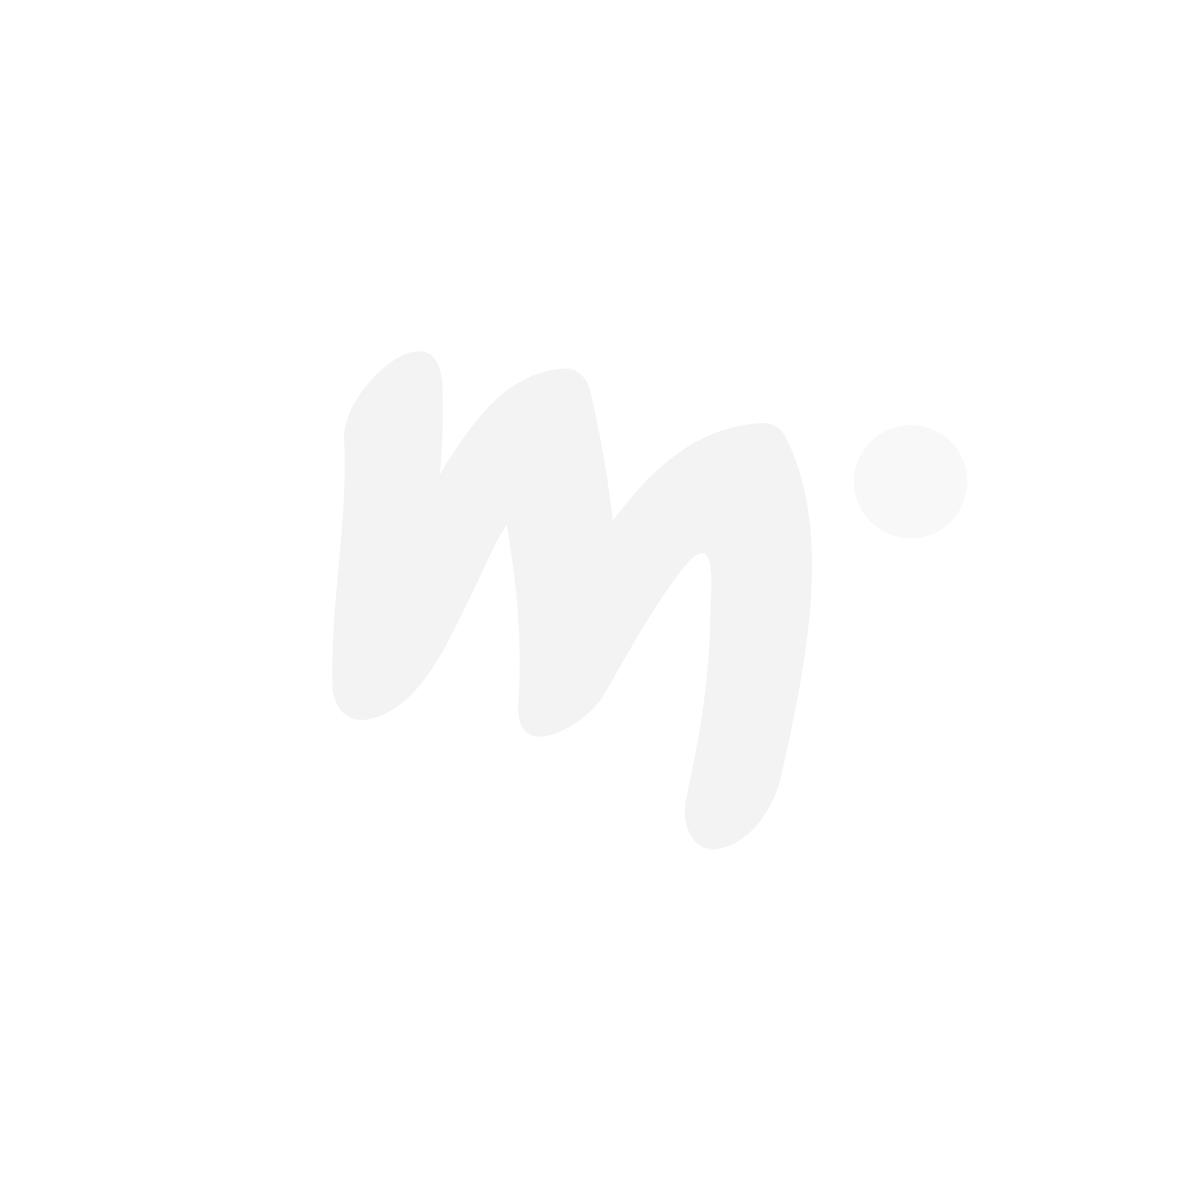 Moomin Tray Puzzle Set 20 & 40 Pieces